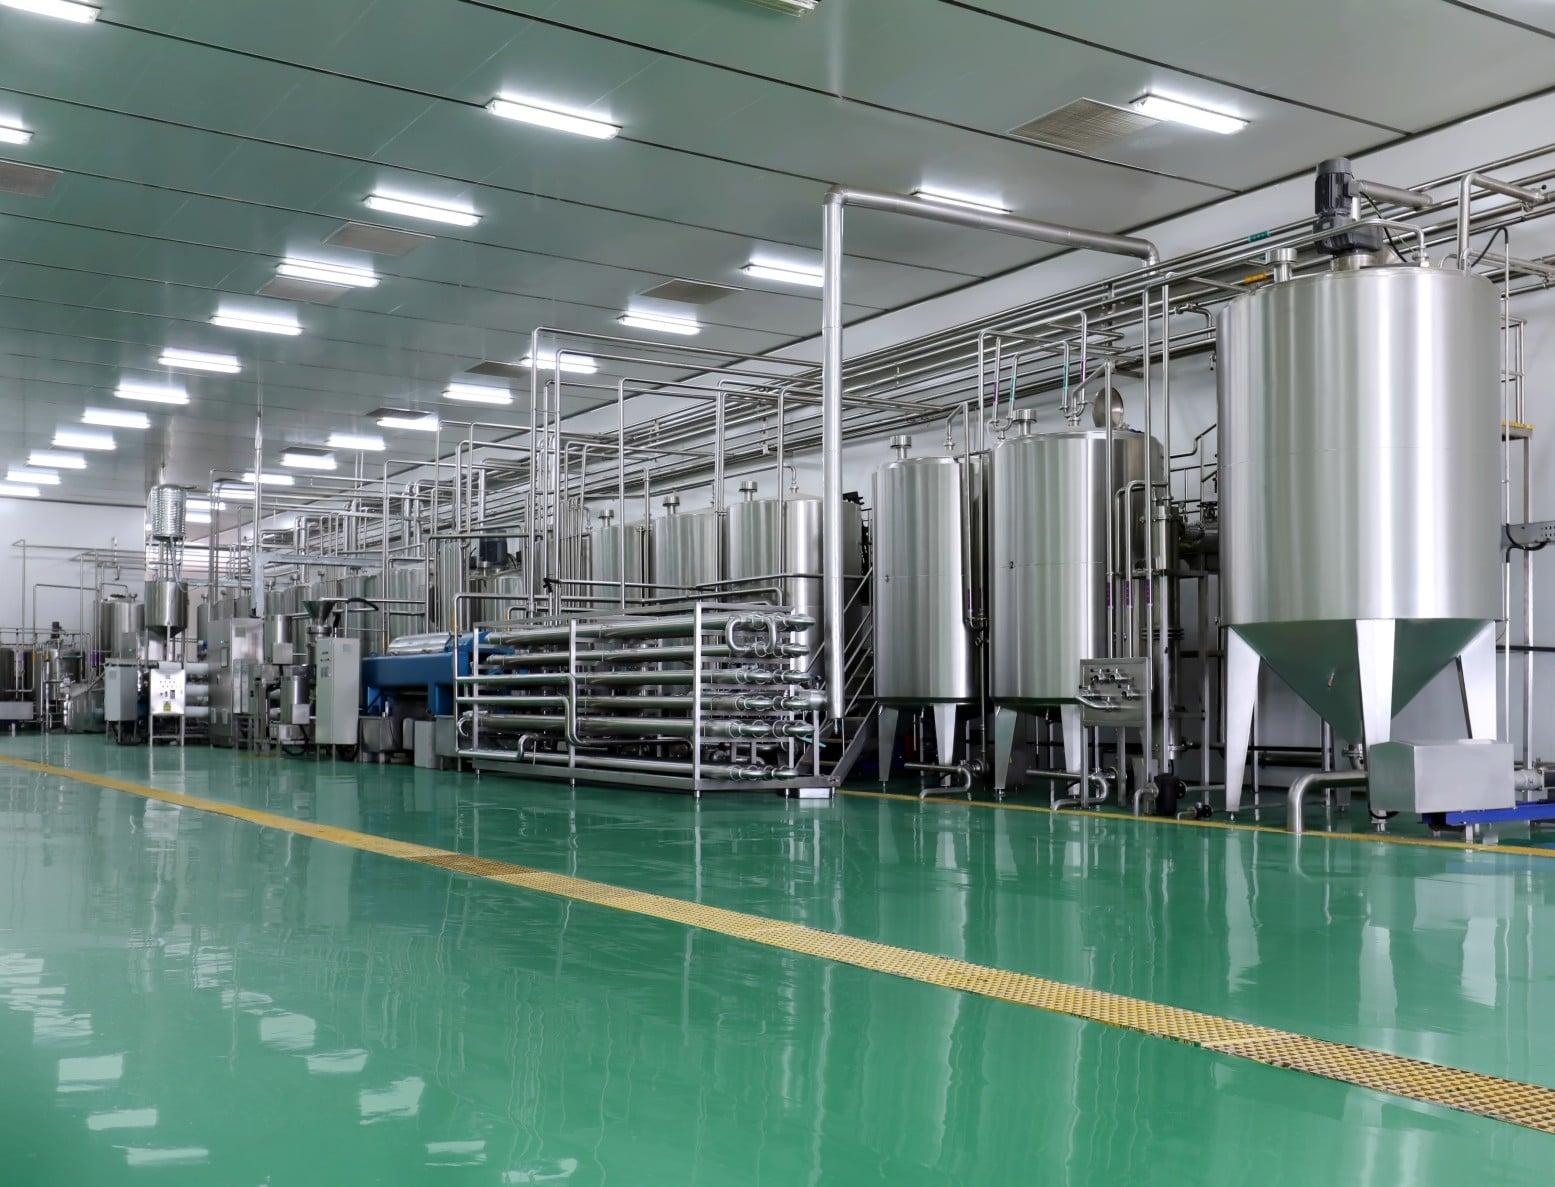 Yogurt production factory